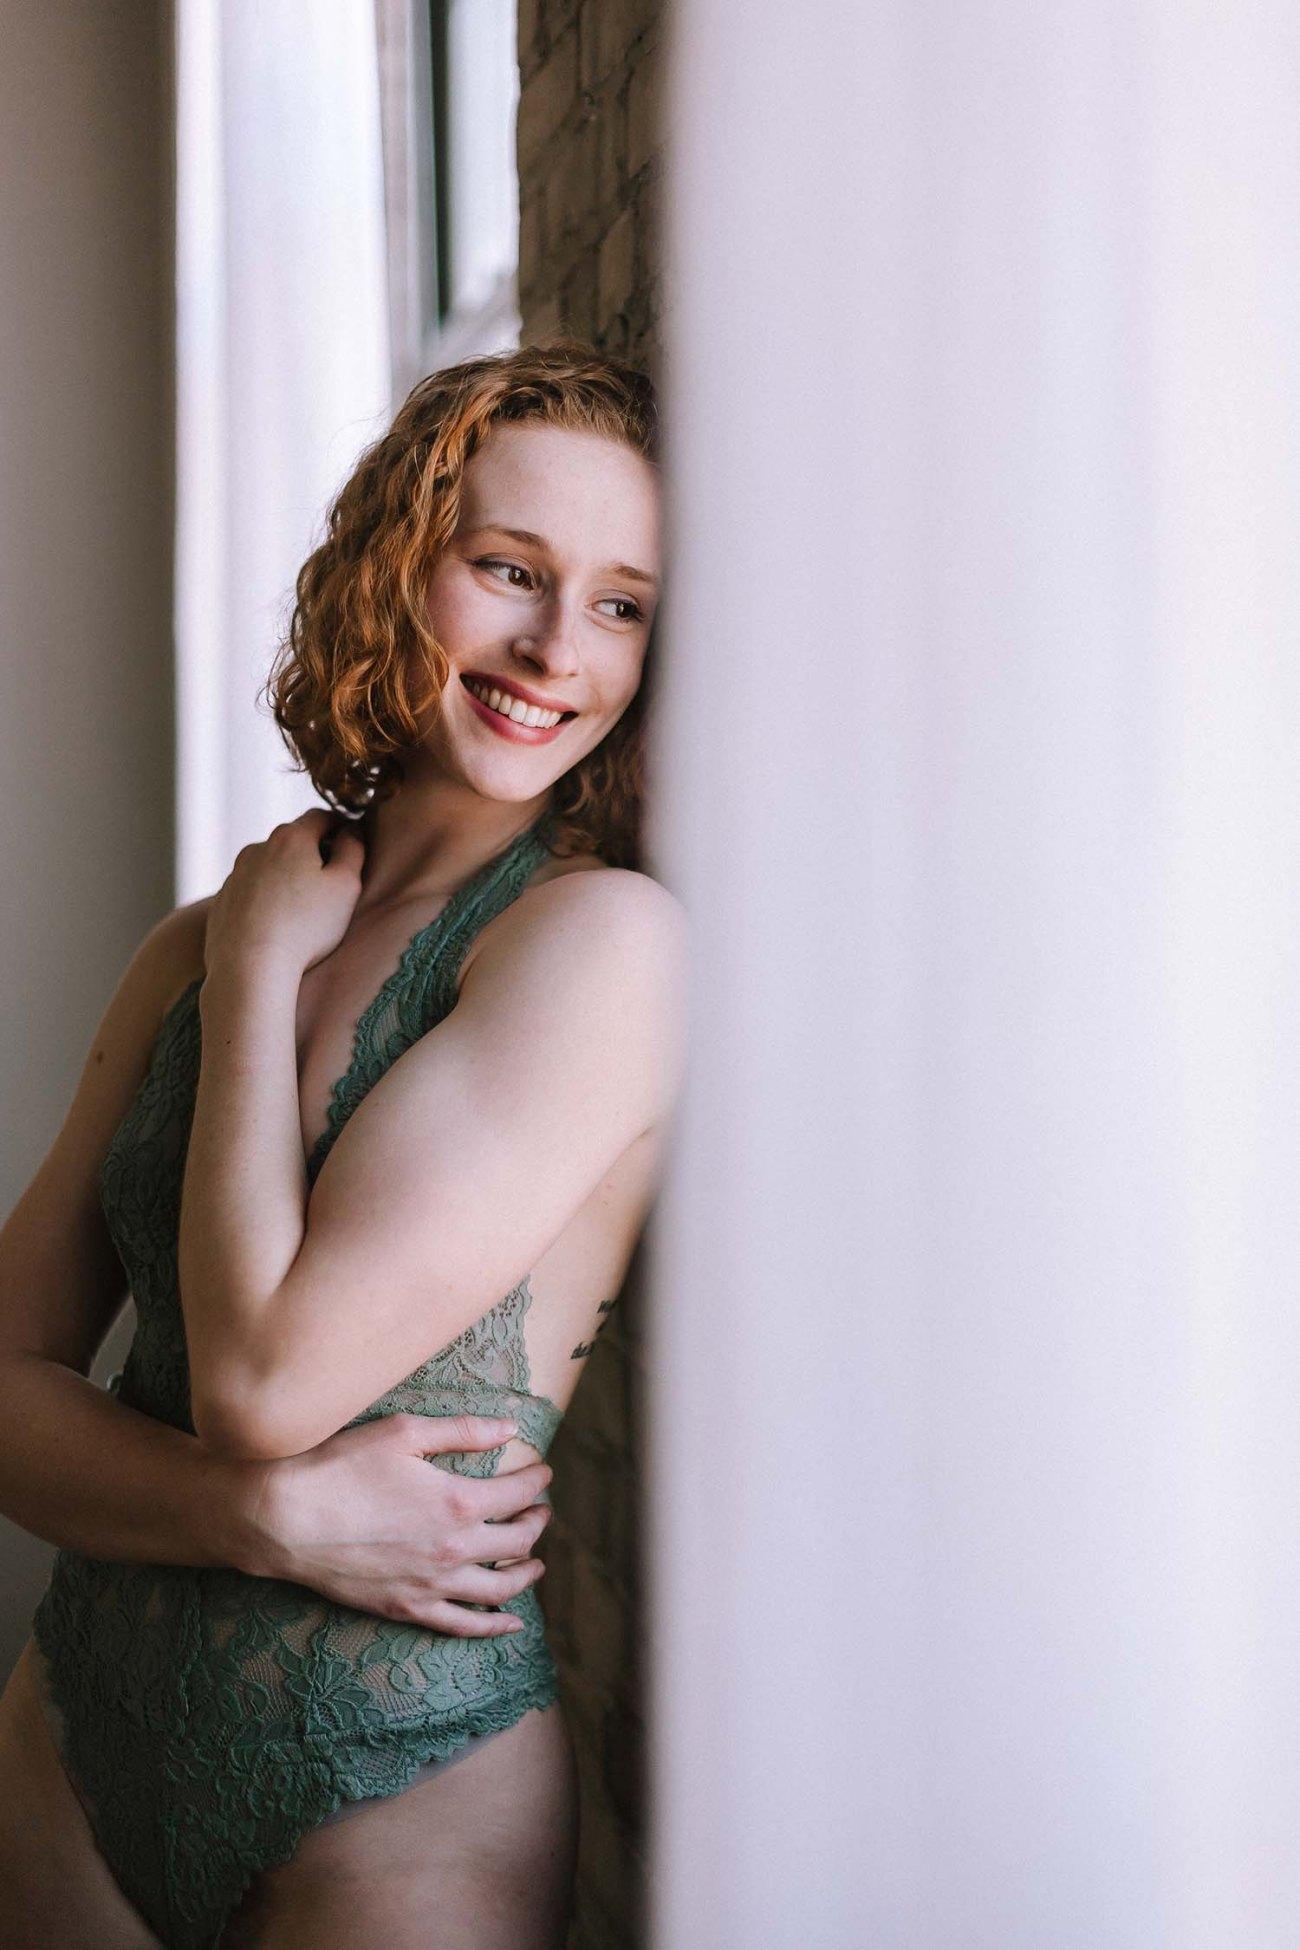 sexy woman women in lingerie, elegant fine art photo natural window light  Twin Cities Boudoir Photographers Photography Minnesota